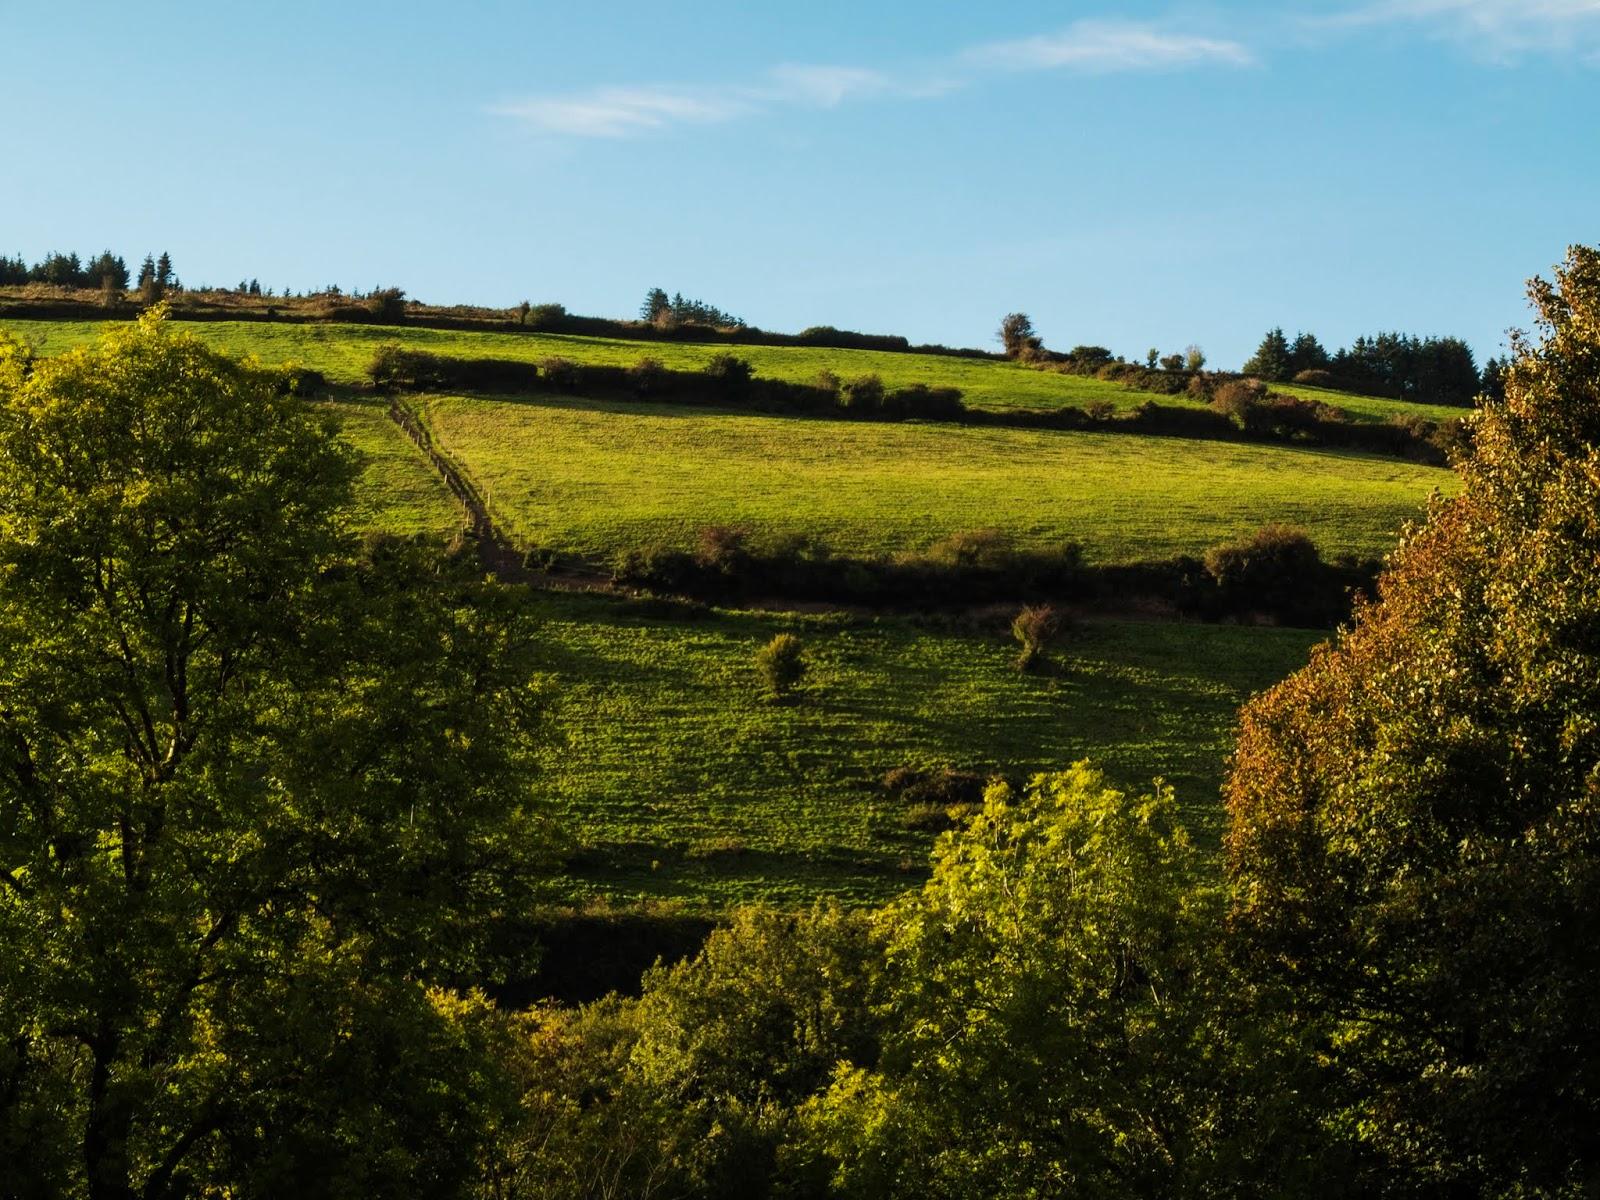 Sun shining on a hillside in the Boggeragh Mountains, Co.Cork.